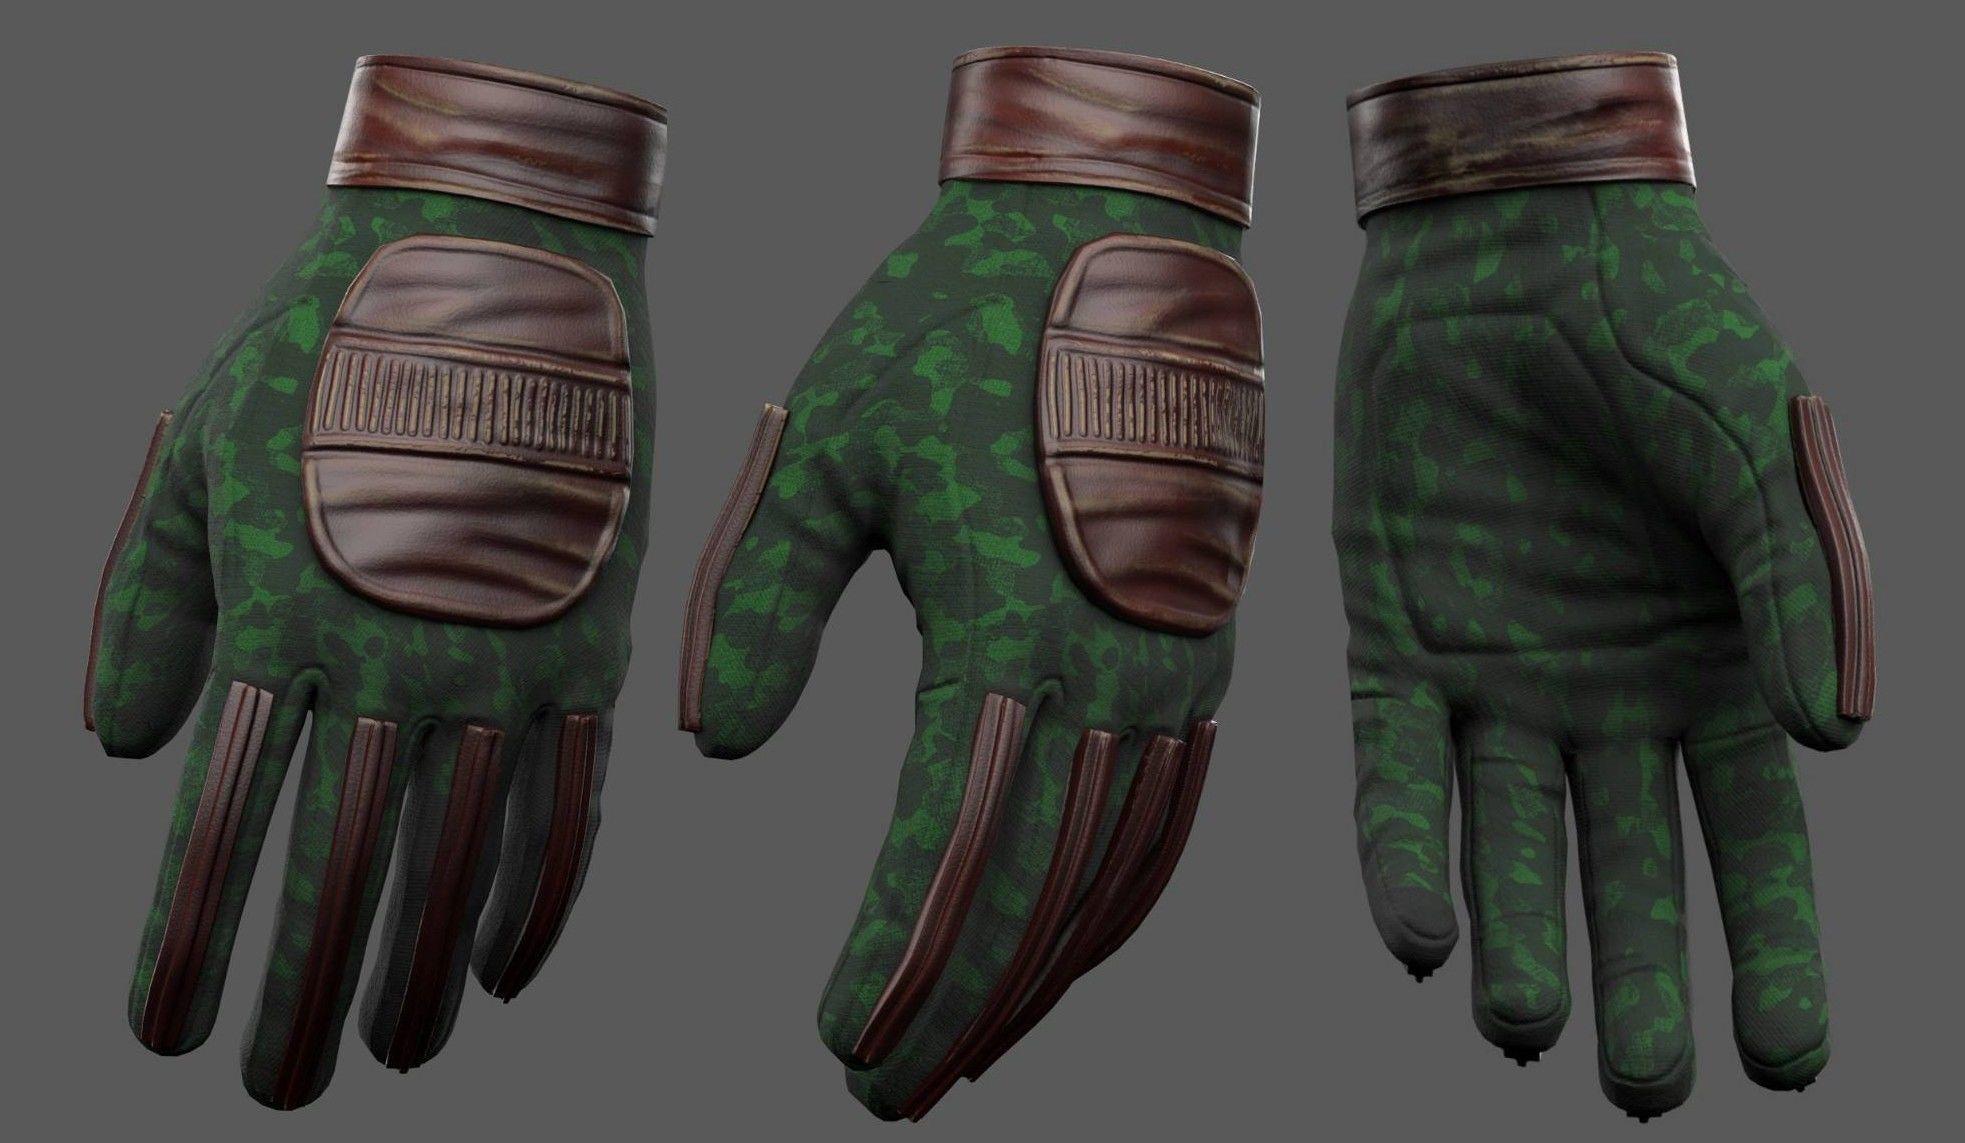 gloves-military-combat-soldier-armor-scifi-fantasy-3d-model-low-poly-obj-mtl-fbx-ma-mb (1) | 3d artist